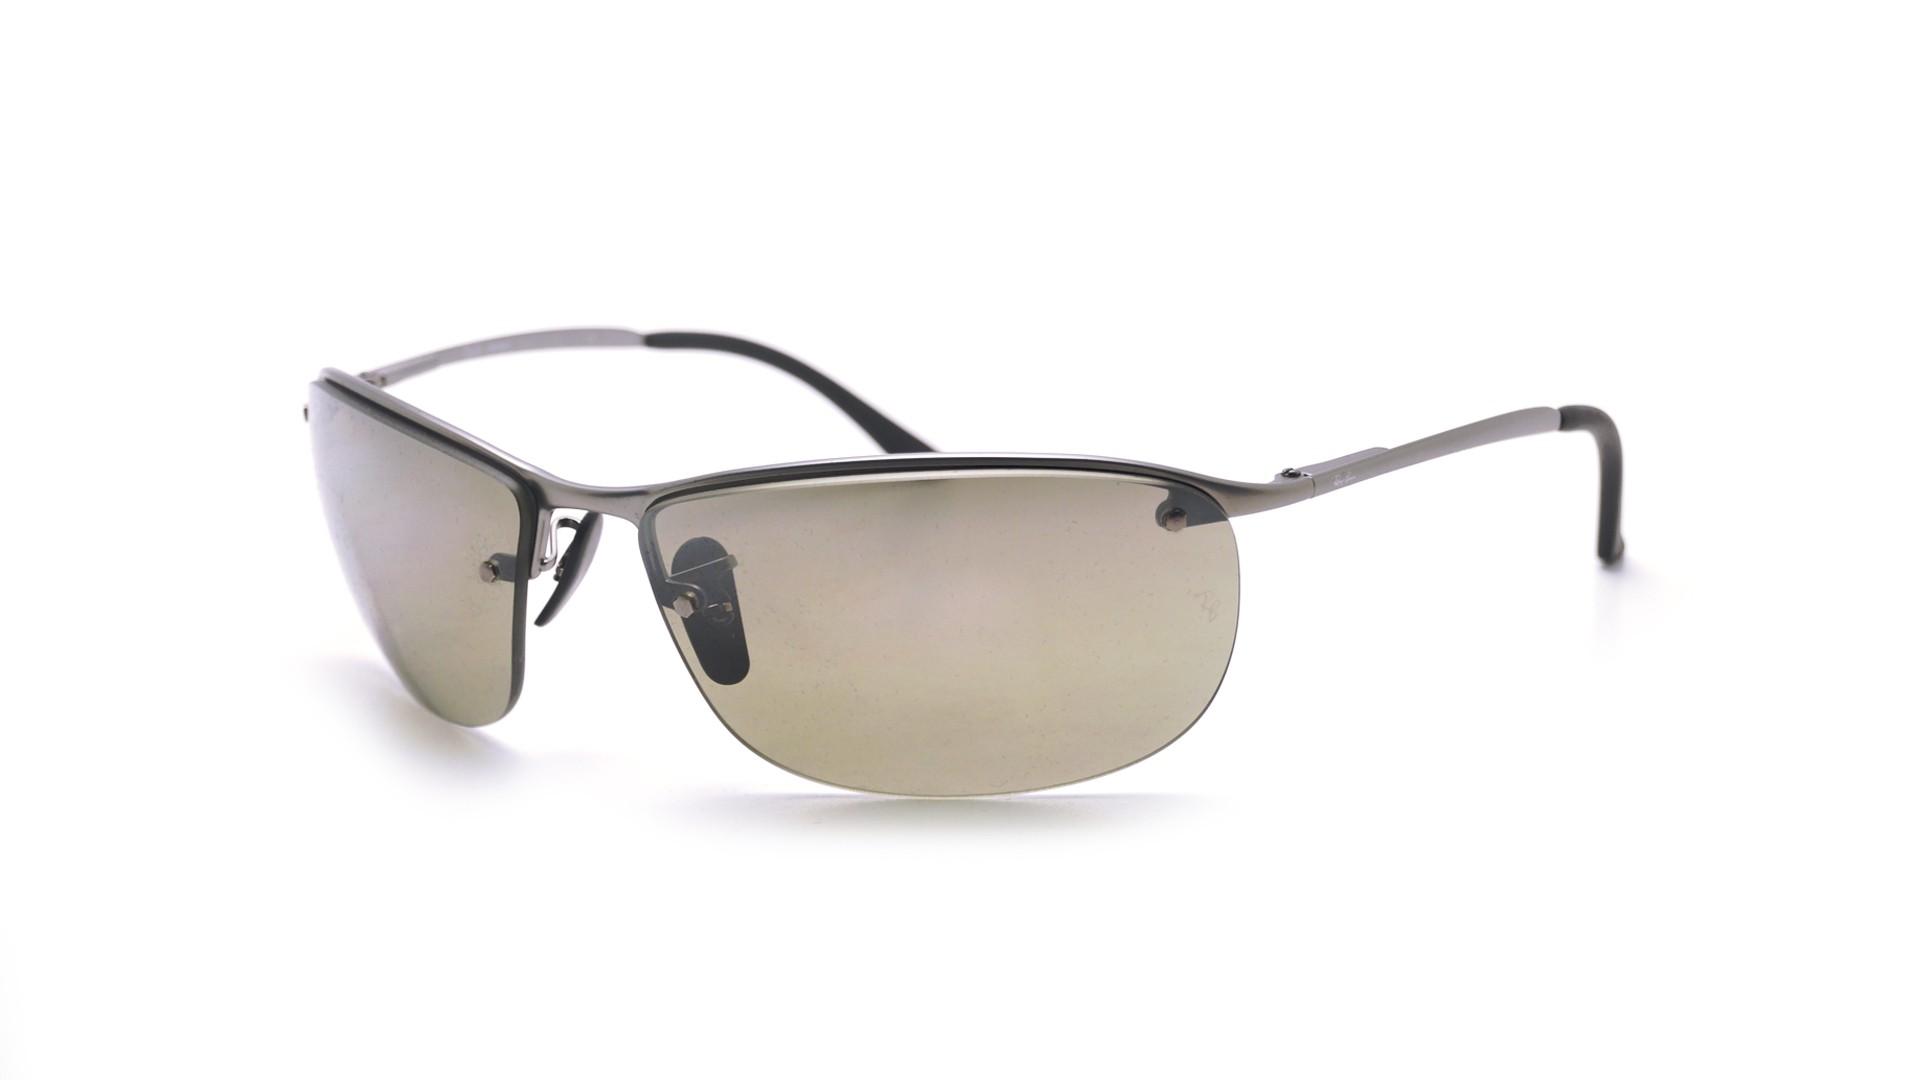 Sunglasses Ray-Ban RB3542 029 5J 63-15 Silver Matte Large Polarized Mirror c0ff357c49b7